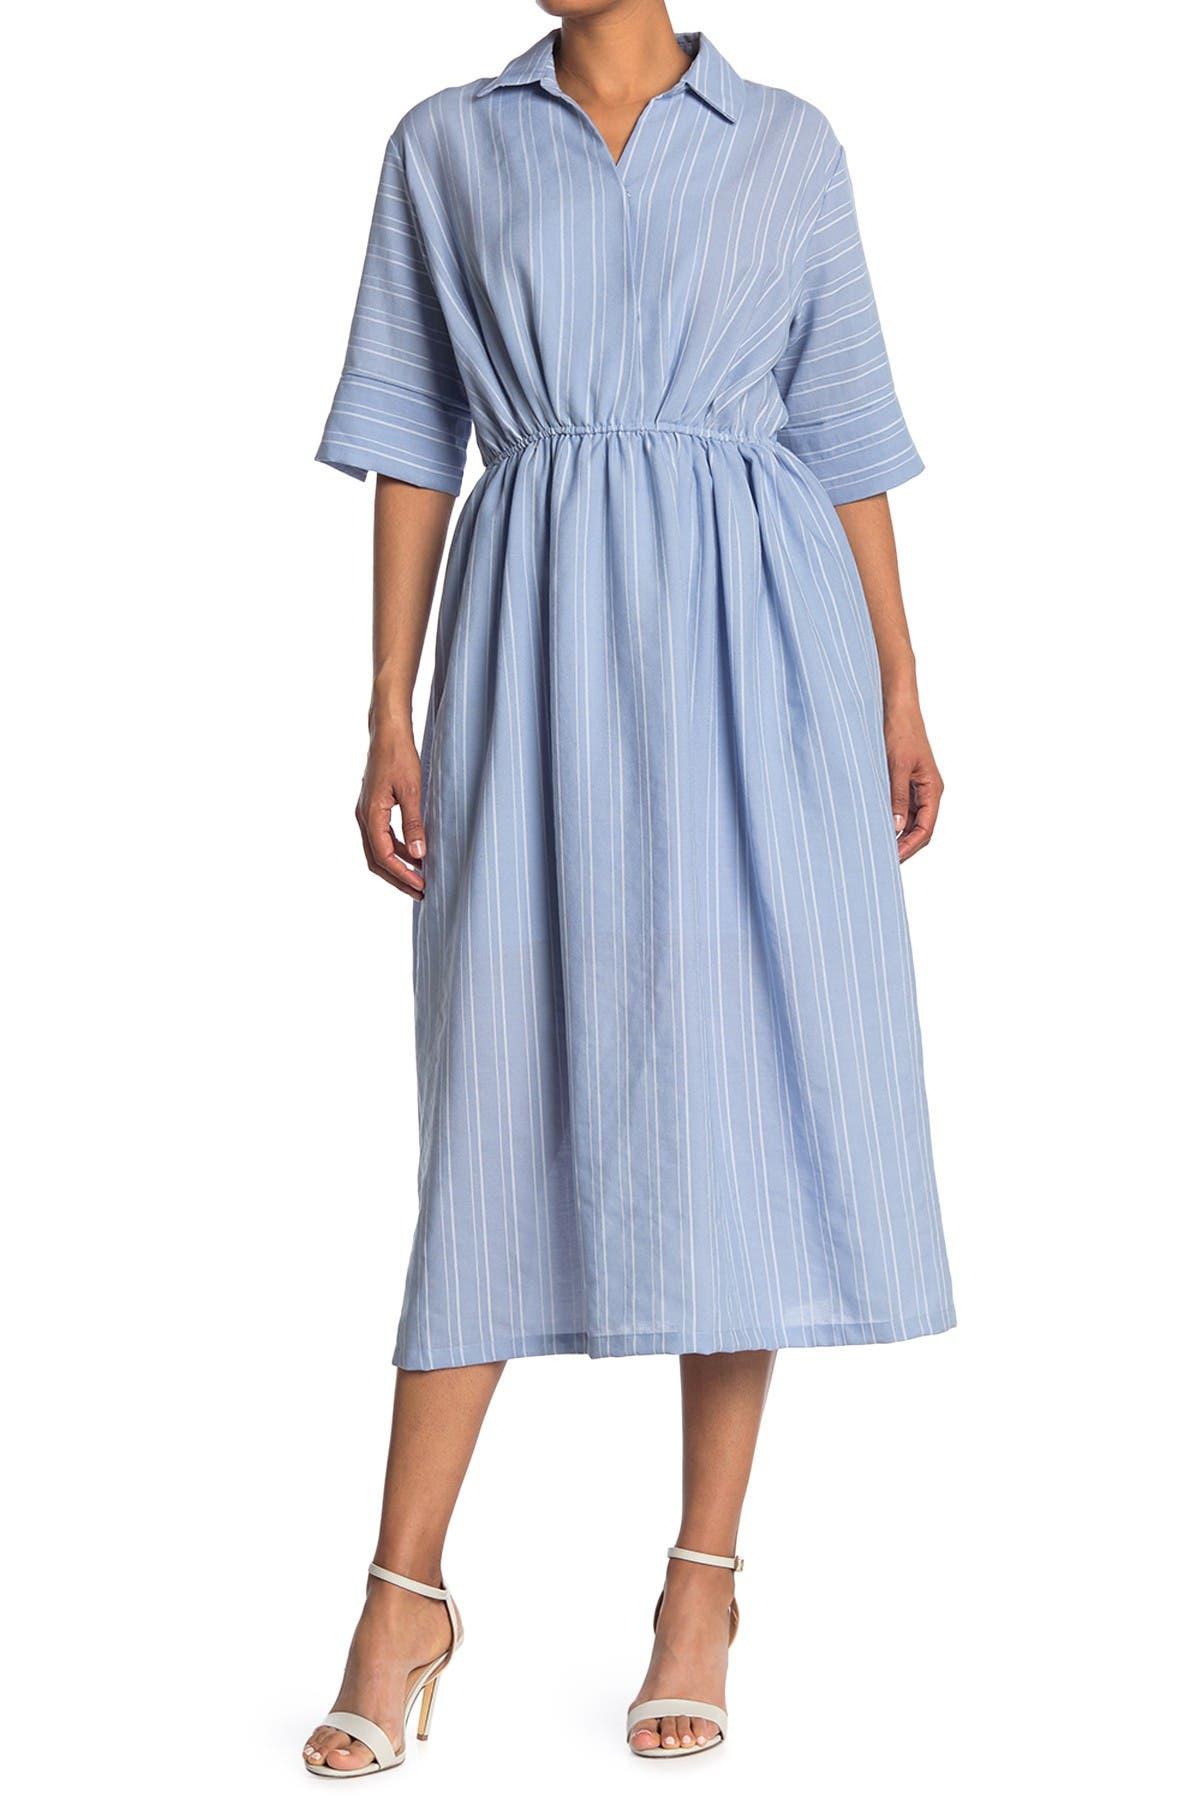 Image of MELLODAY Short Sleeve V-Neck Elastic Waist Midi Dress